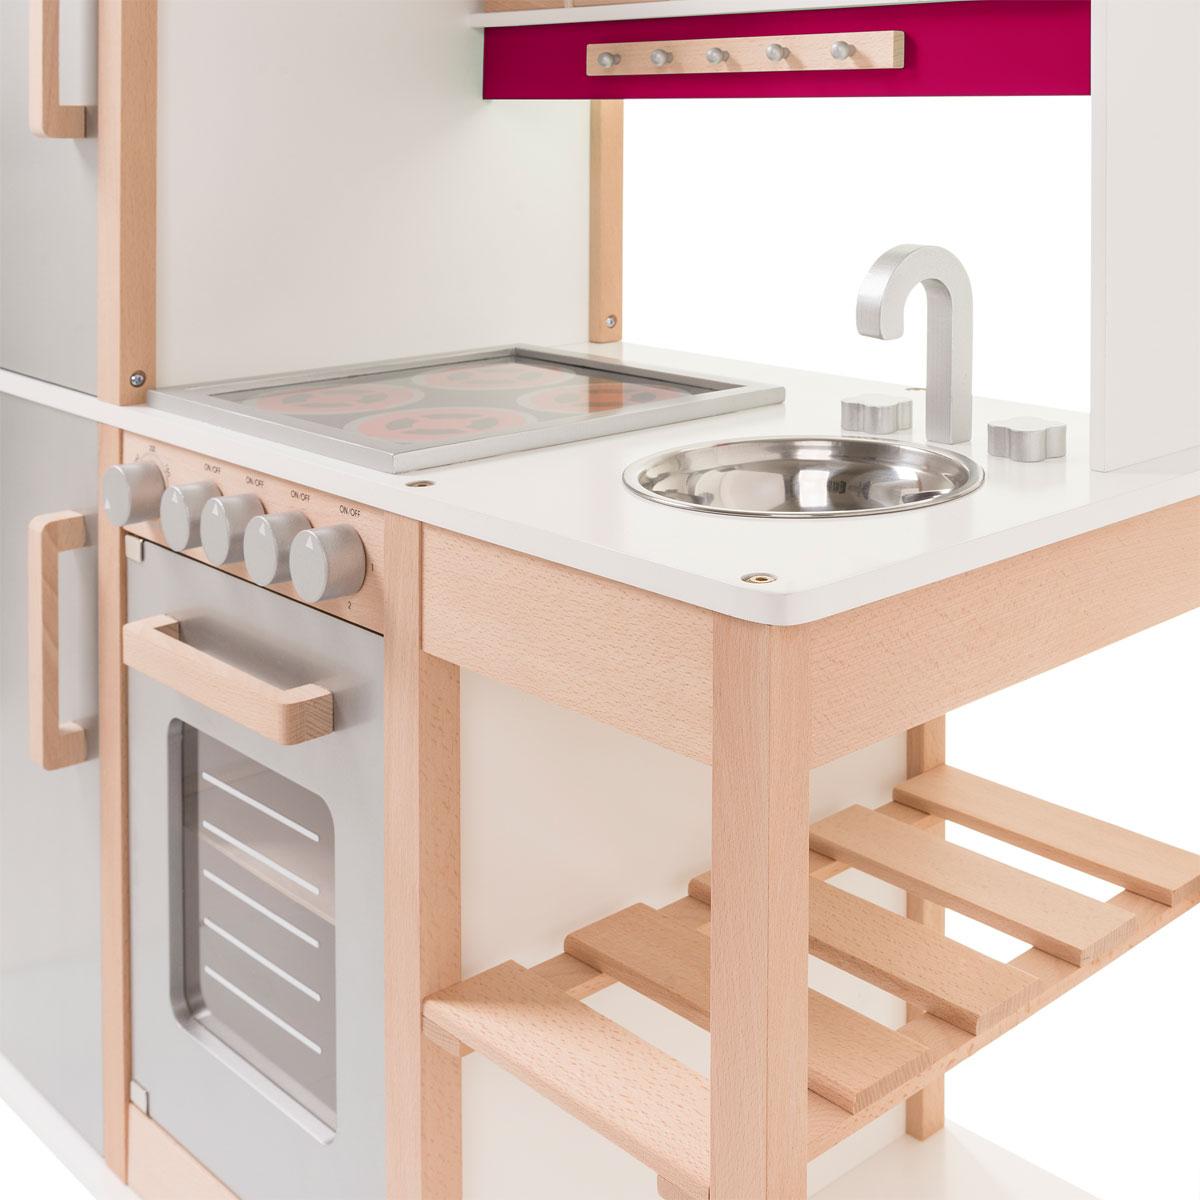 SUN 04136 Kinderküche natur-beere aus Holz mit Kühlschrank